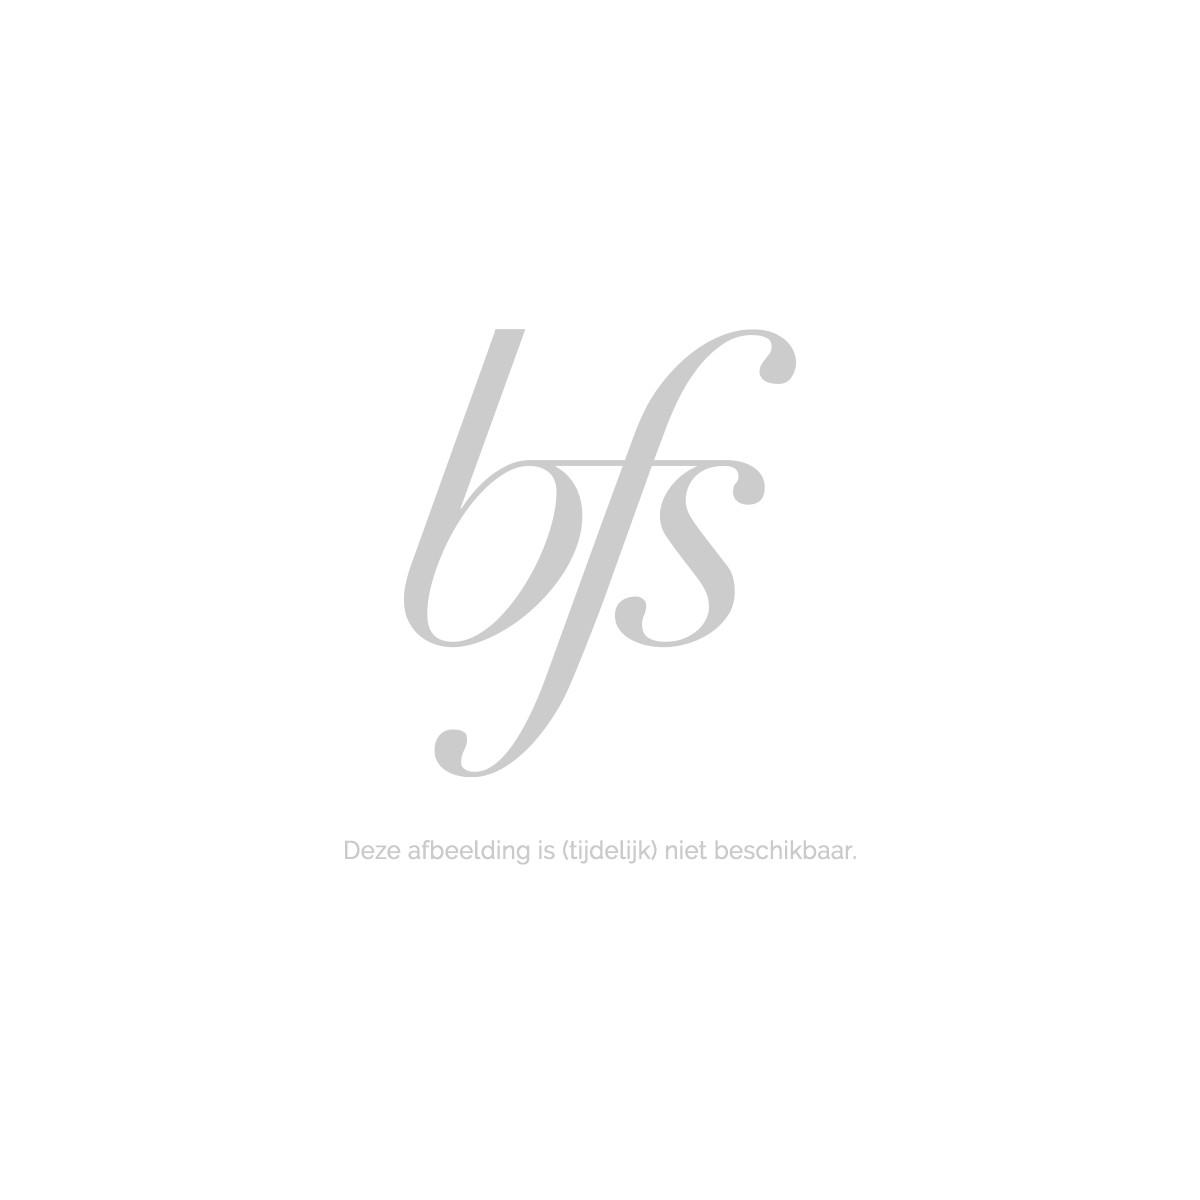 Revlon Bold Lacquer Lenght and Volume Mascara 001 Blackest Black Waterproof